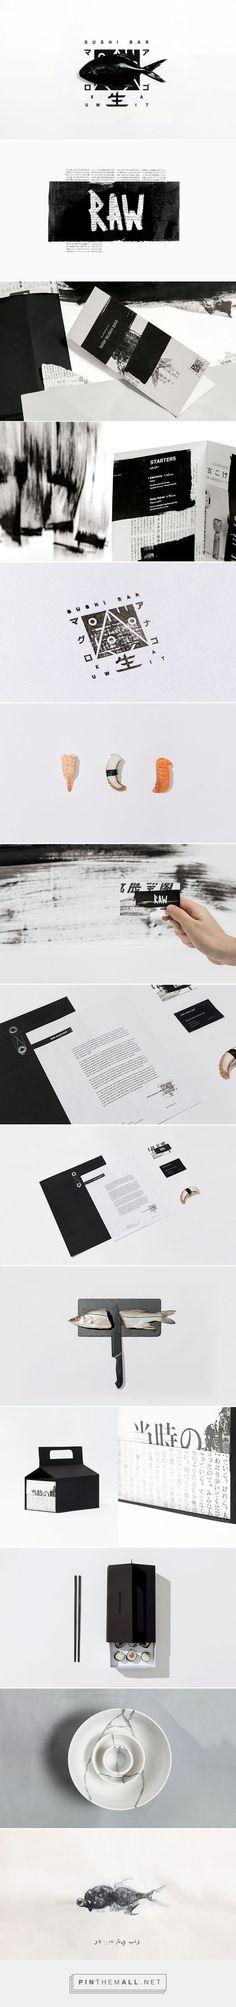 dans-ta-pub-creation-brand-identity-compilation-11